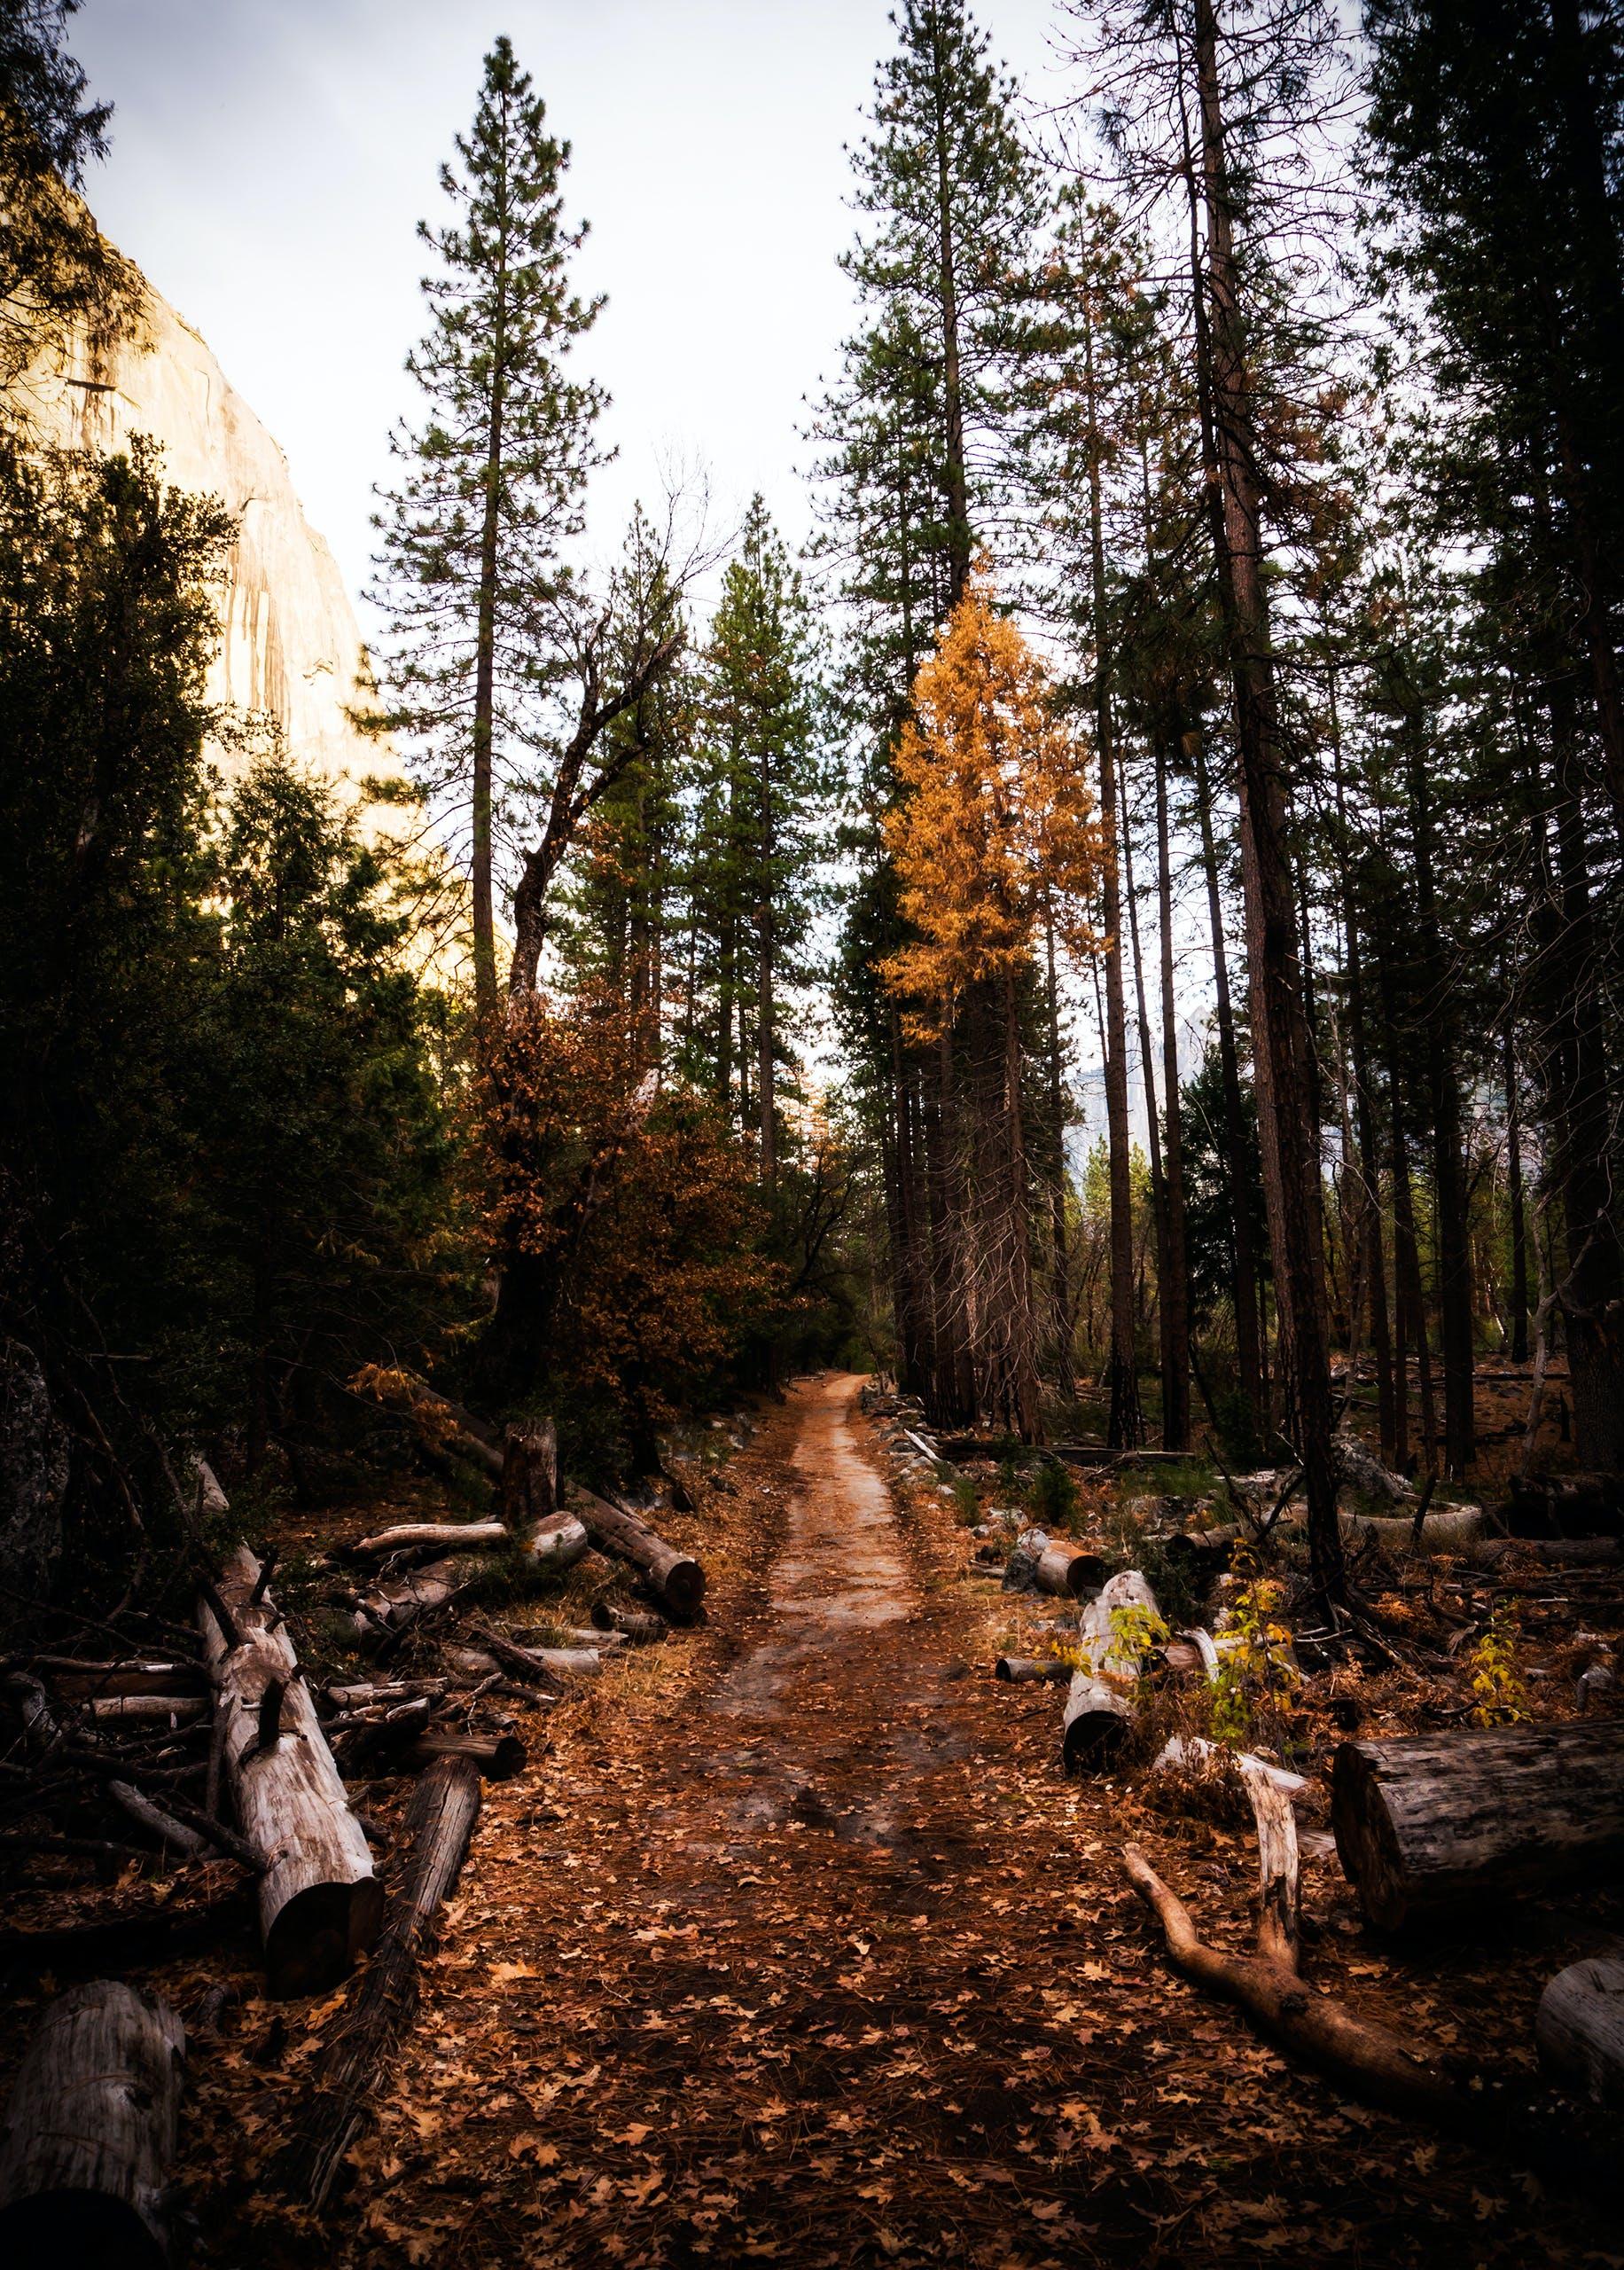 Gratis arkivbilde med bartre, dagslys, eviggrønn, fallne trær